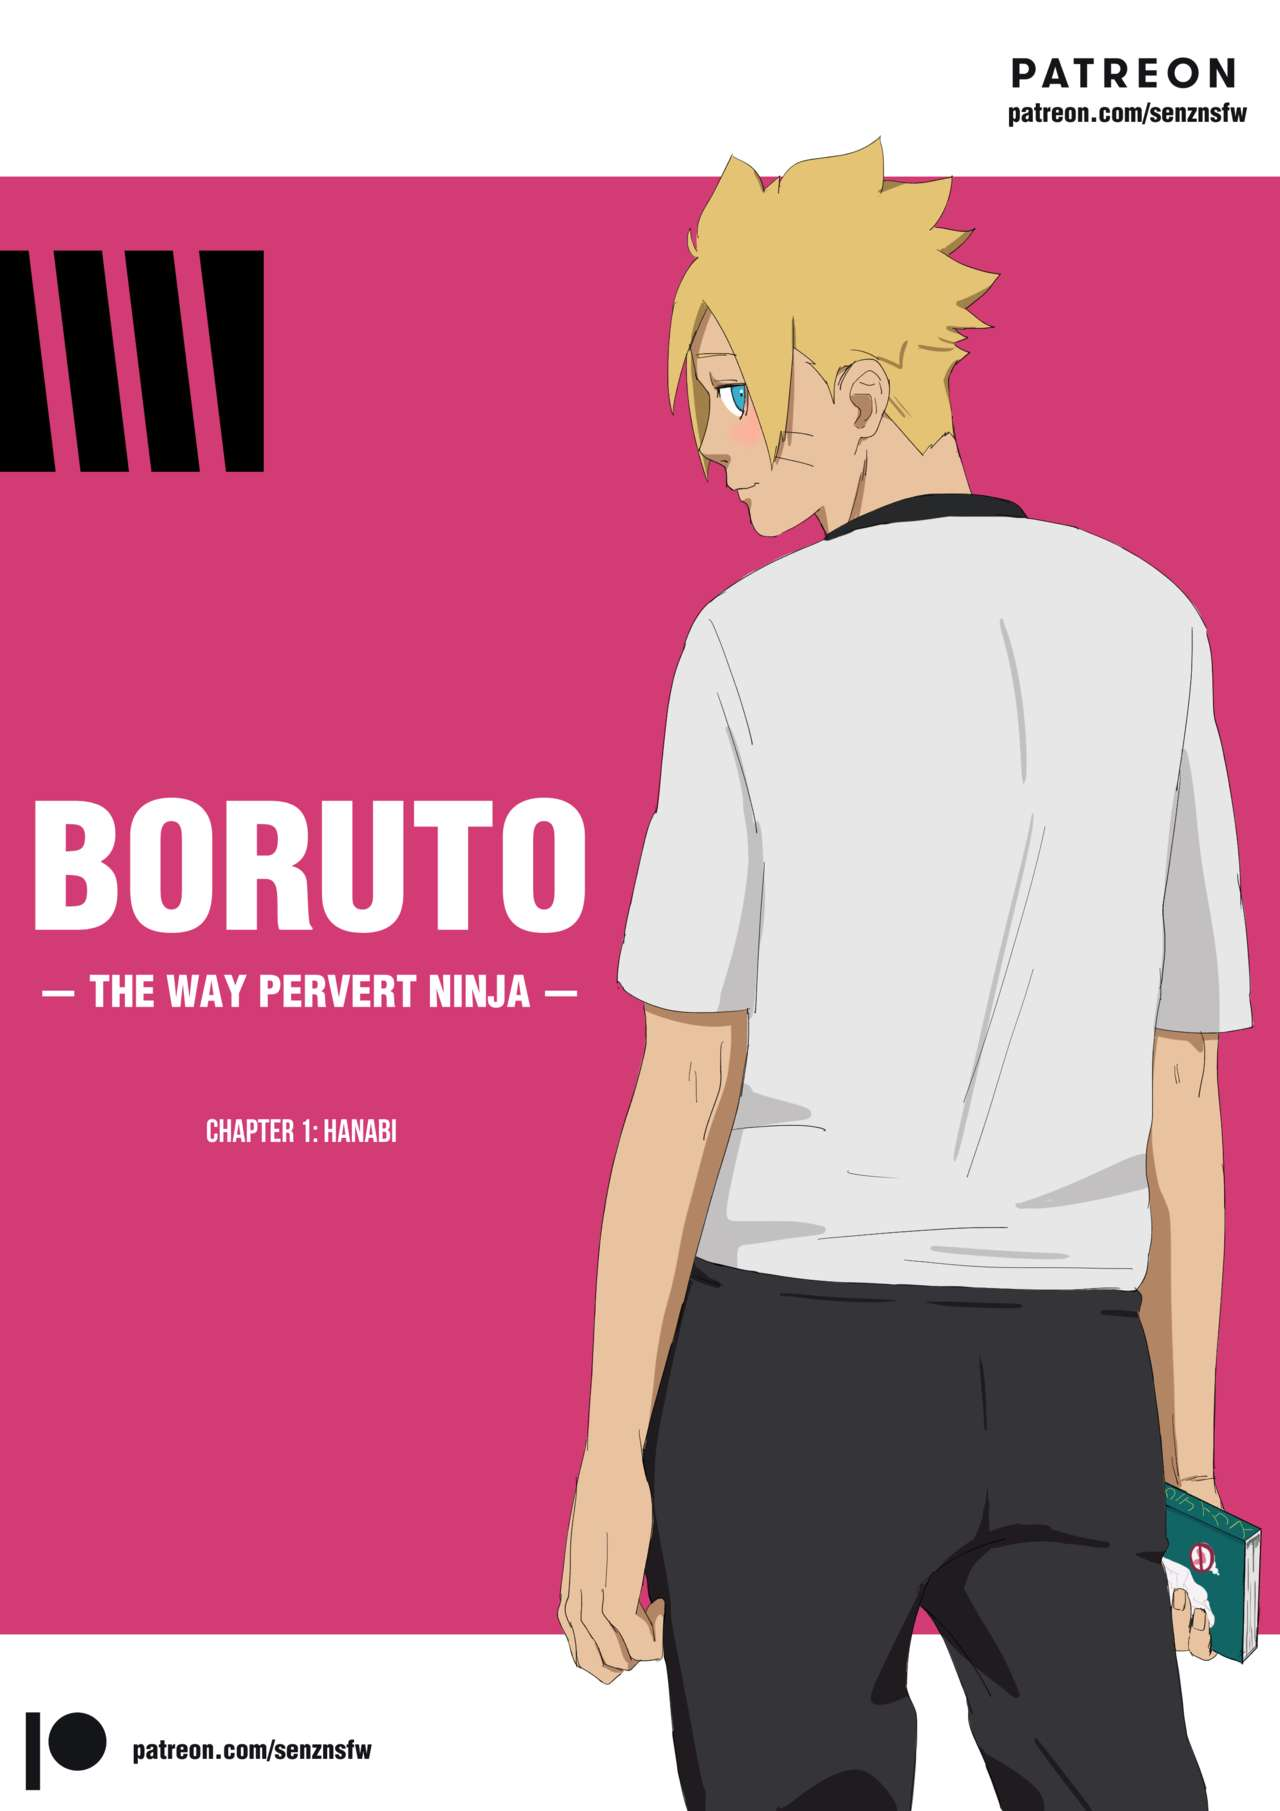 BORUTO - The Way of PERVERT Ninja